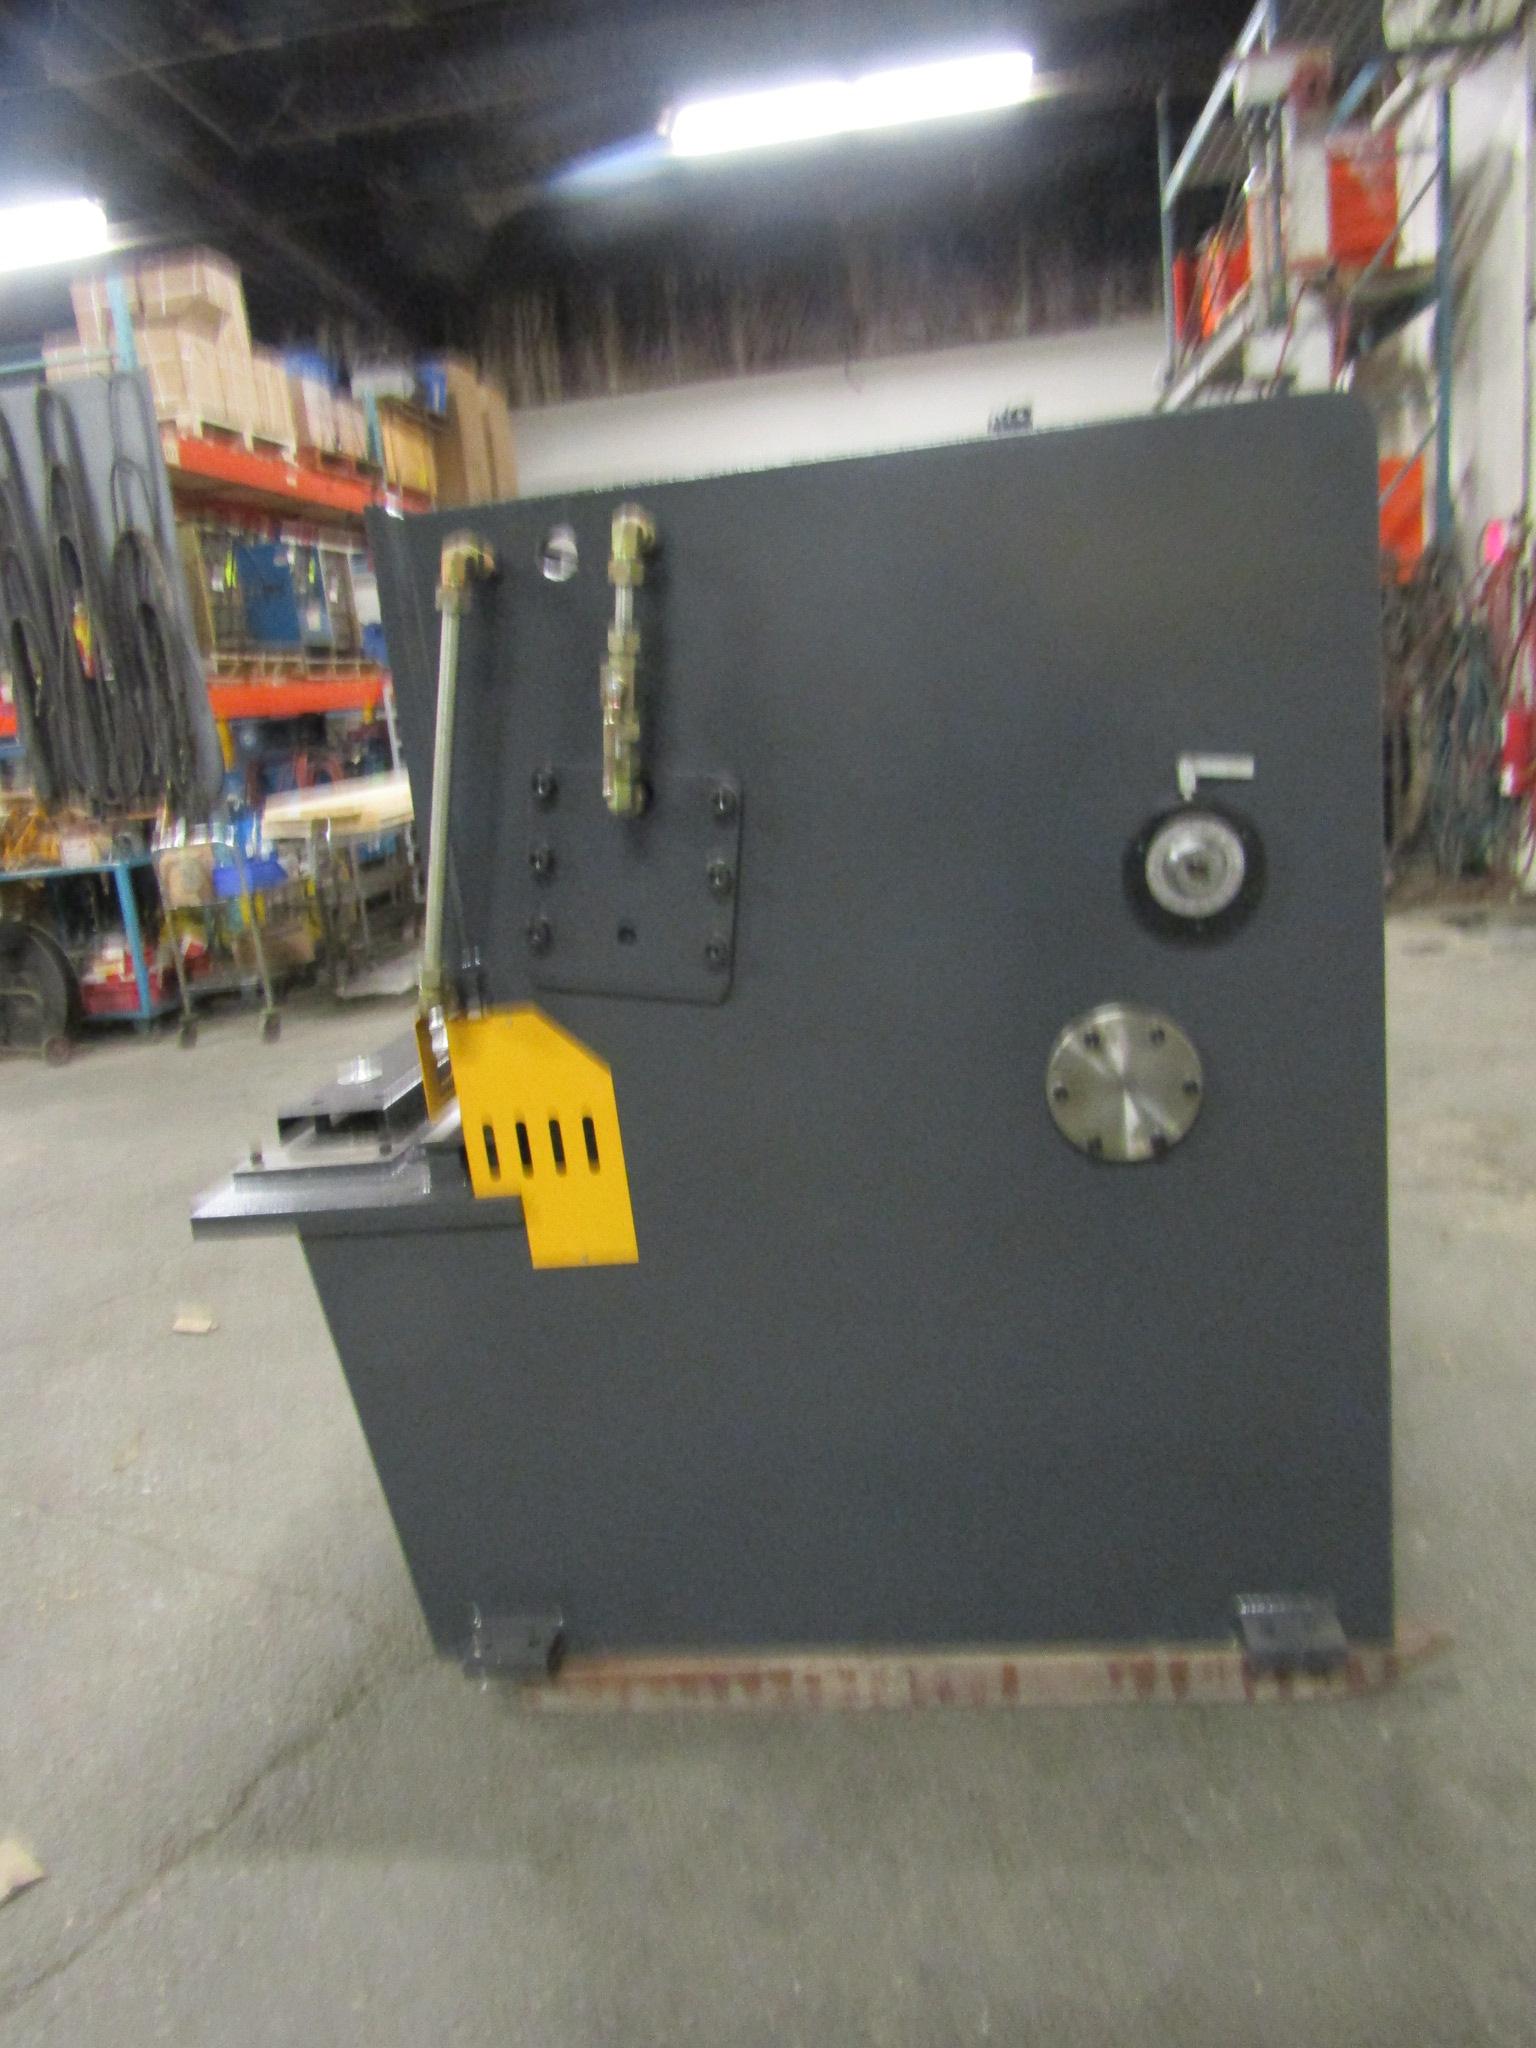 "Lot 234 - Bernardo Hydraulic Shear 1/4"" max capacity 98"" width - 480/575V 3 phase MINT UNUSED UNIT complete"